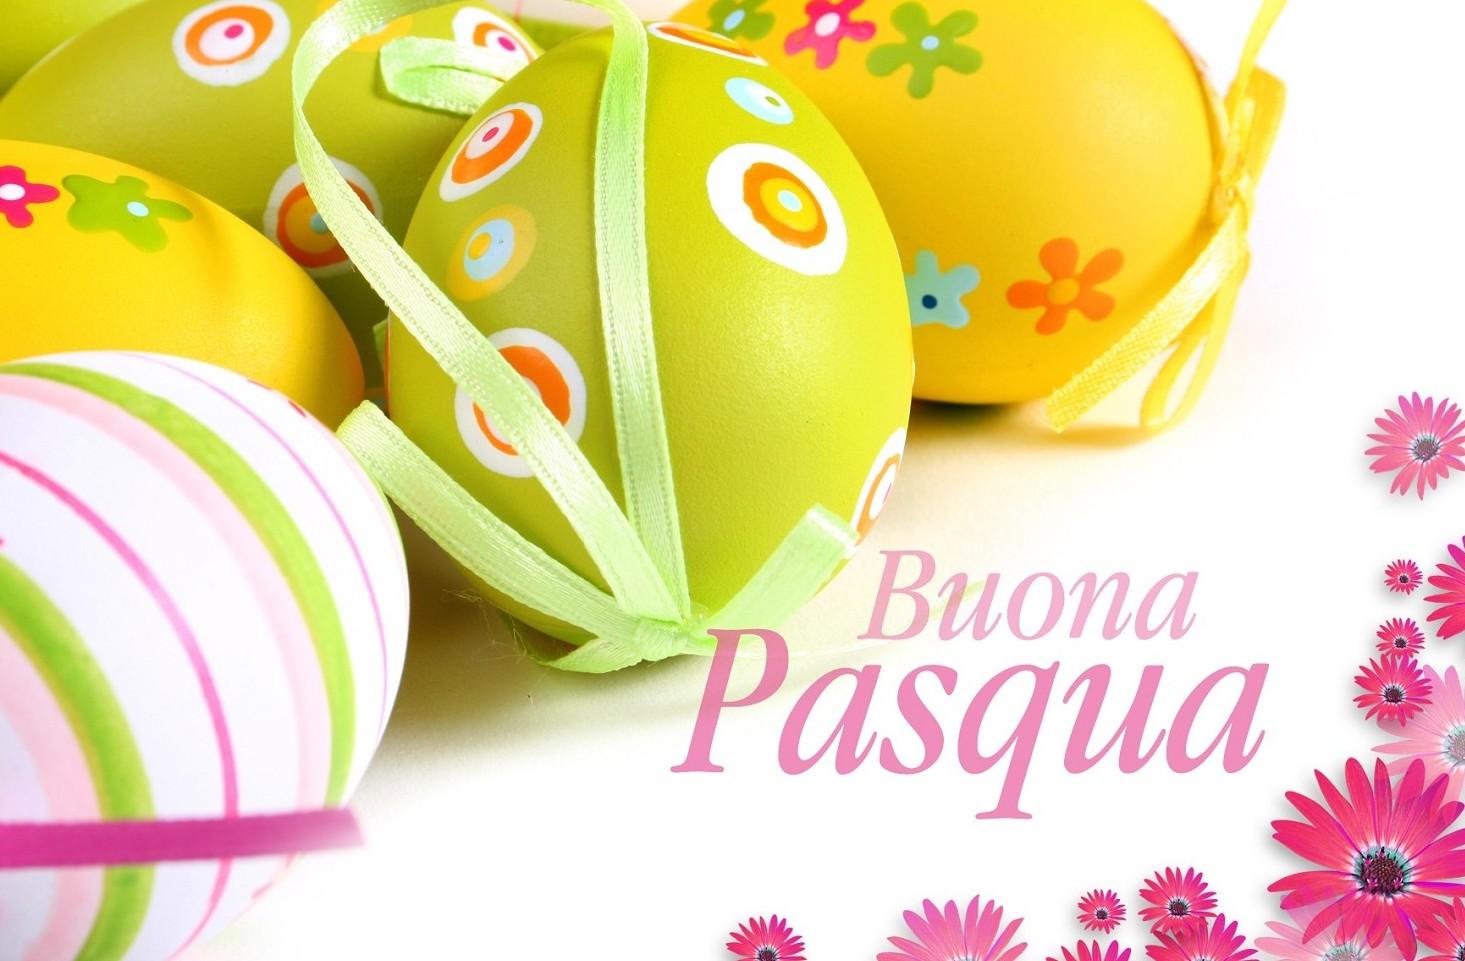 Auguri di Pasqua poesie, frasi, dediche,